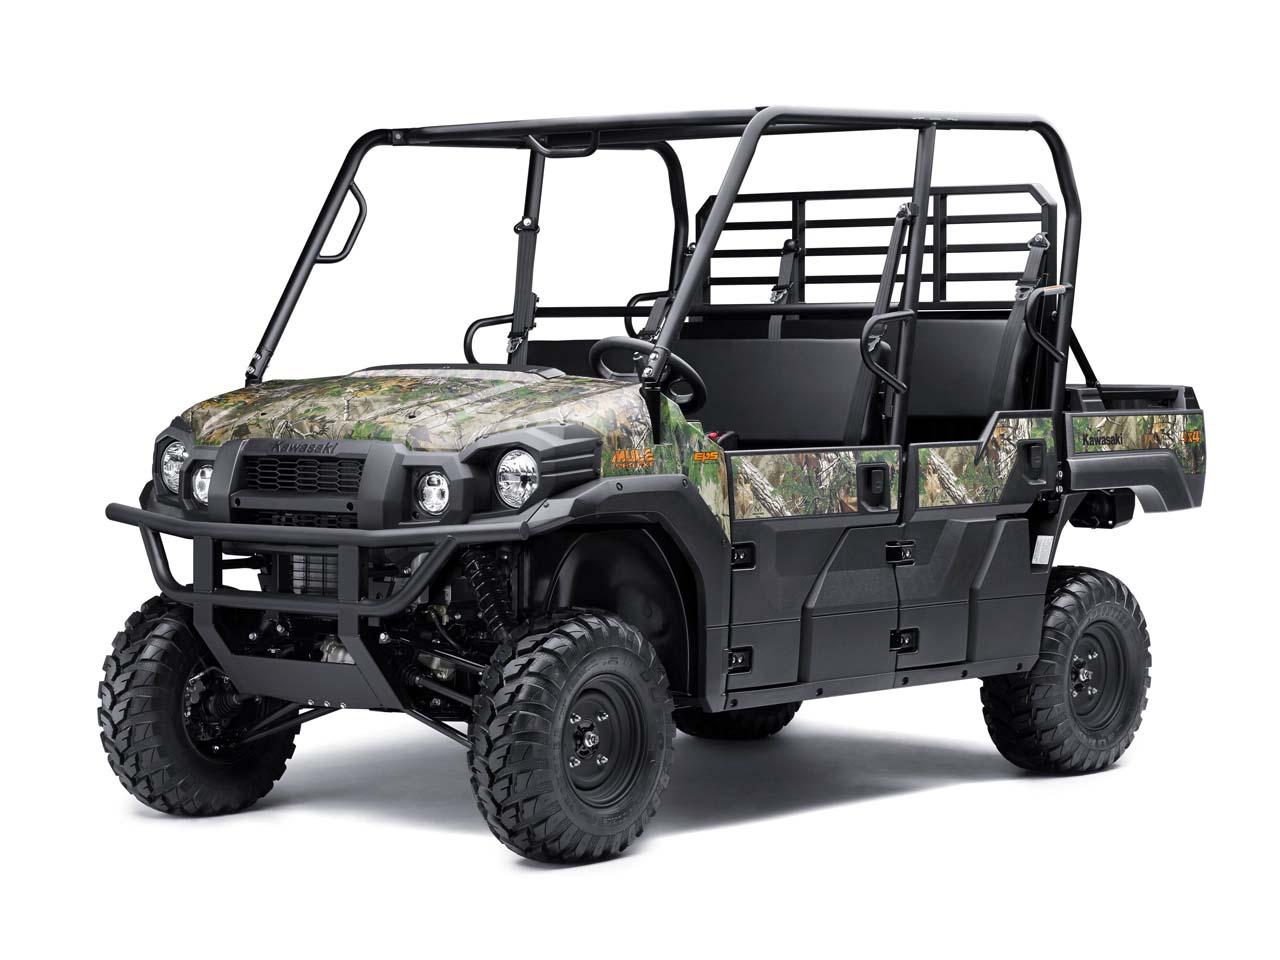 Mule Side X Sides Utvs Kawasaki Utility Vehicles | Autos Post